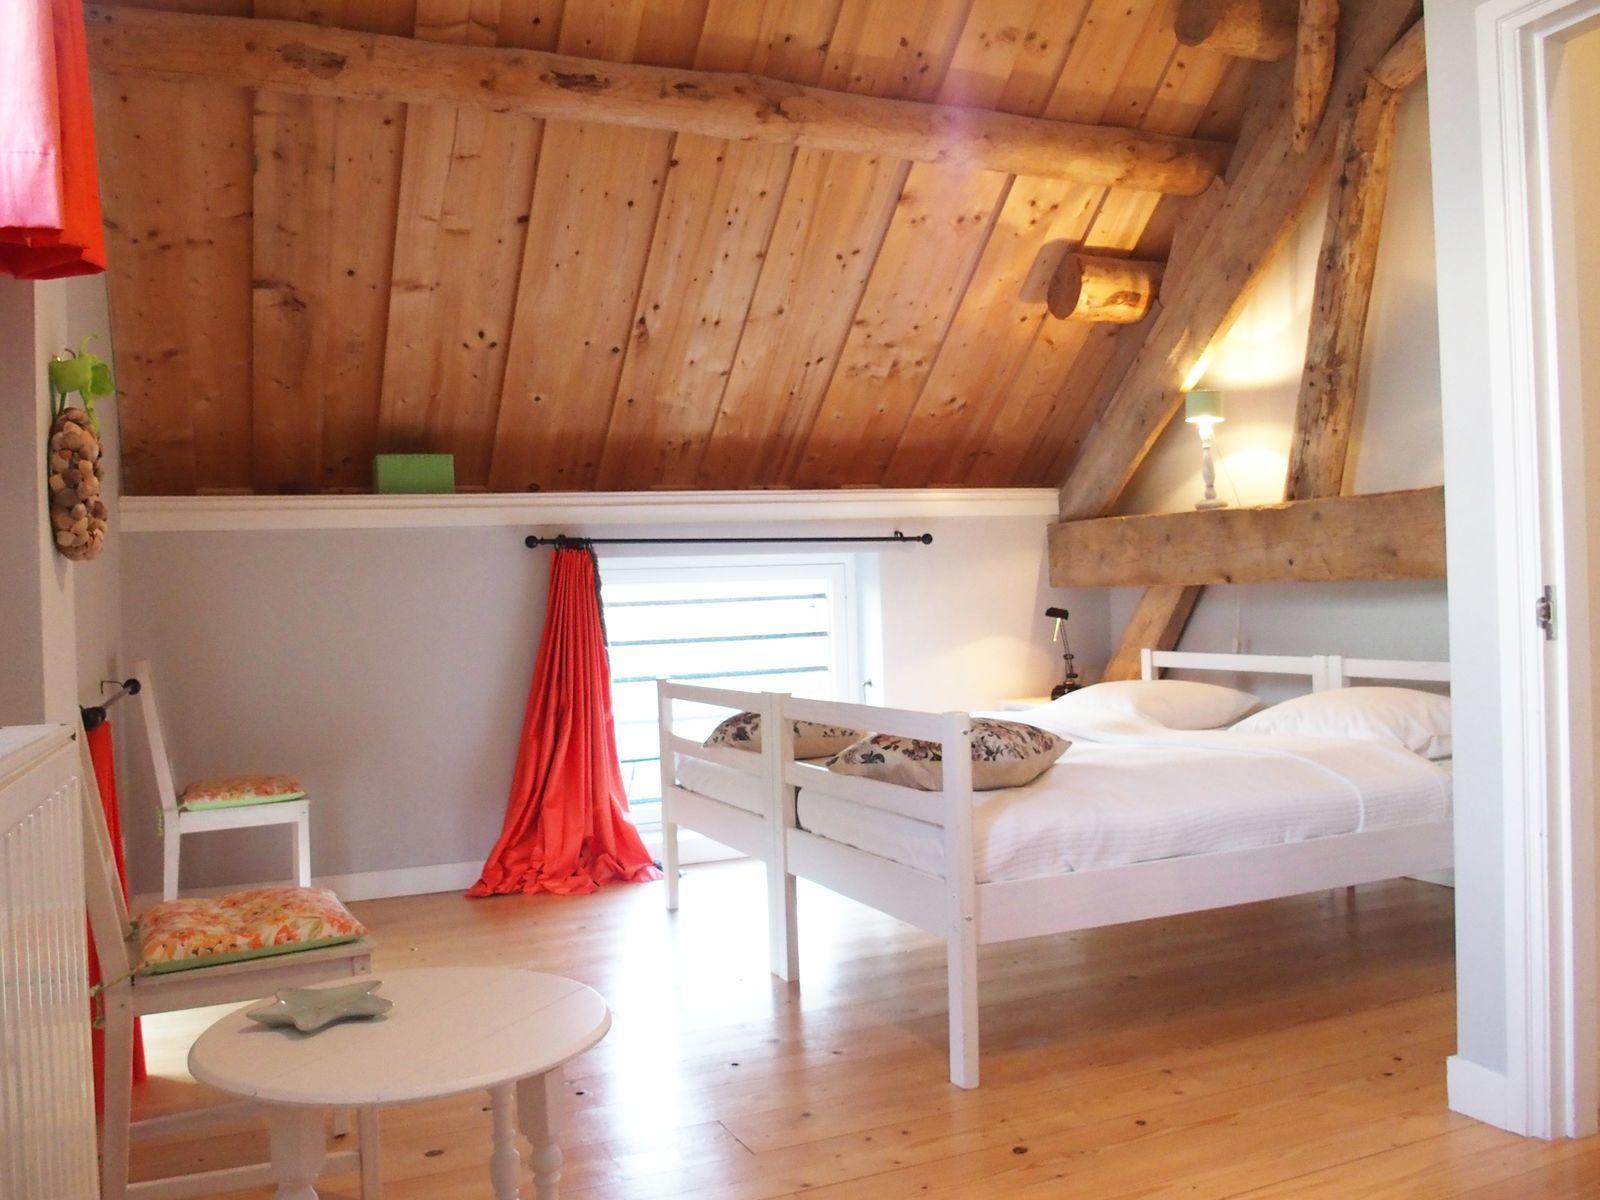 Vakantiehuis Klein Berkenbosch